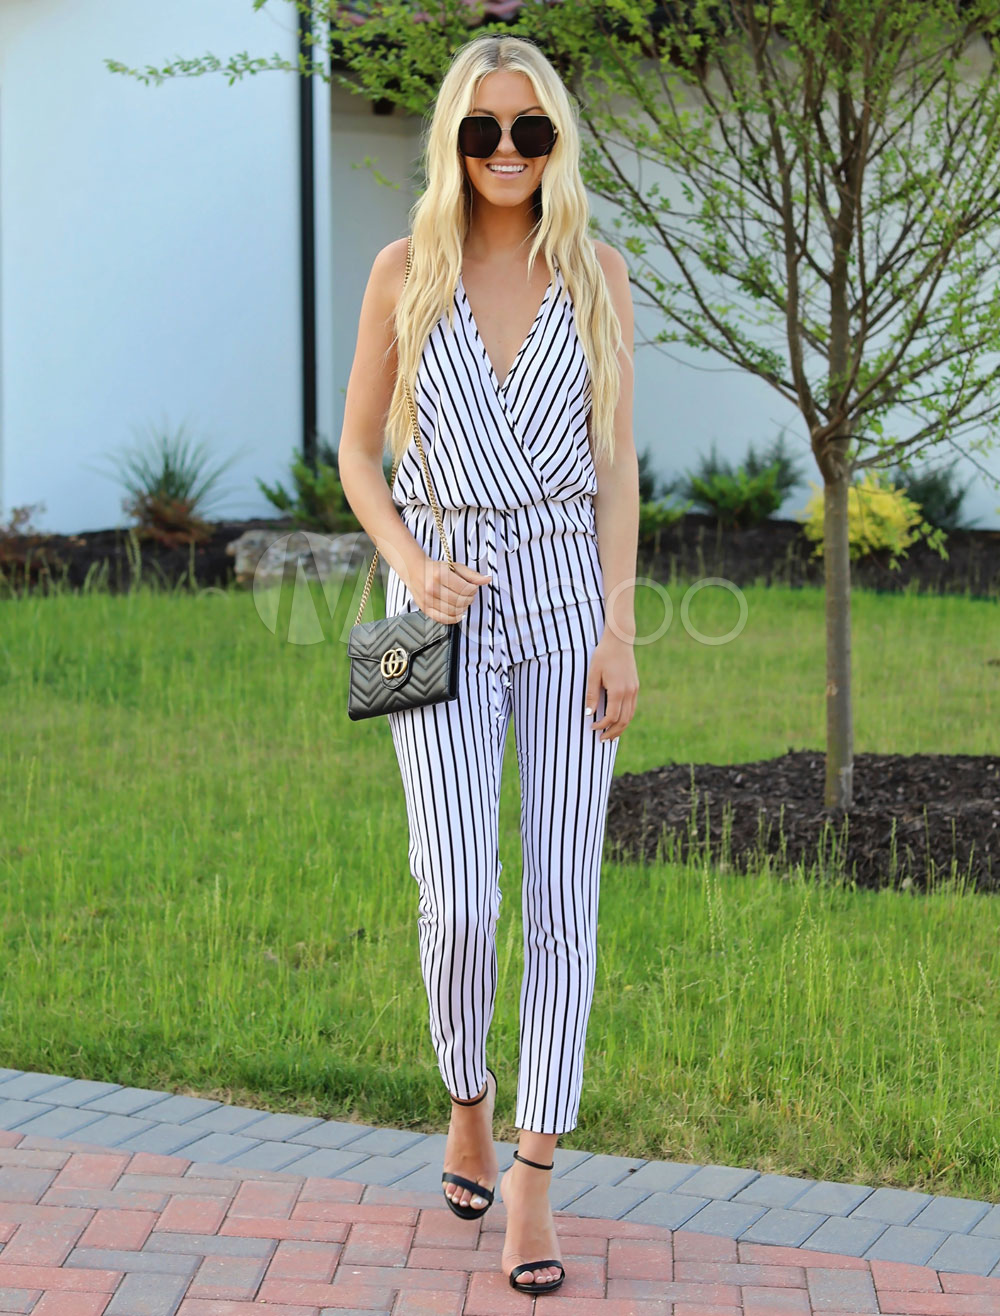 Buy White Striped Jumpsuit V Neck Sleeveless Summer Jumpsuit For Women for $23.99 in Milanoo store